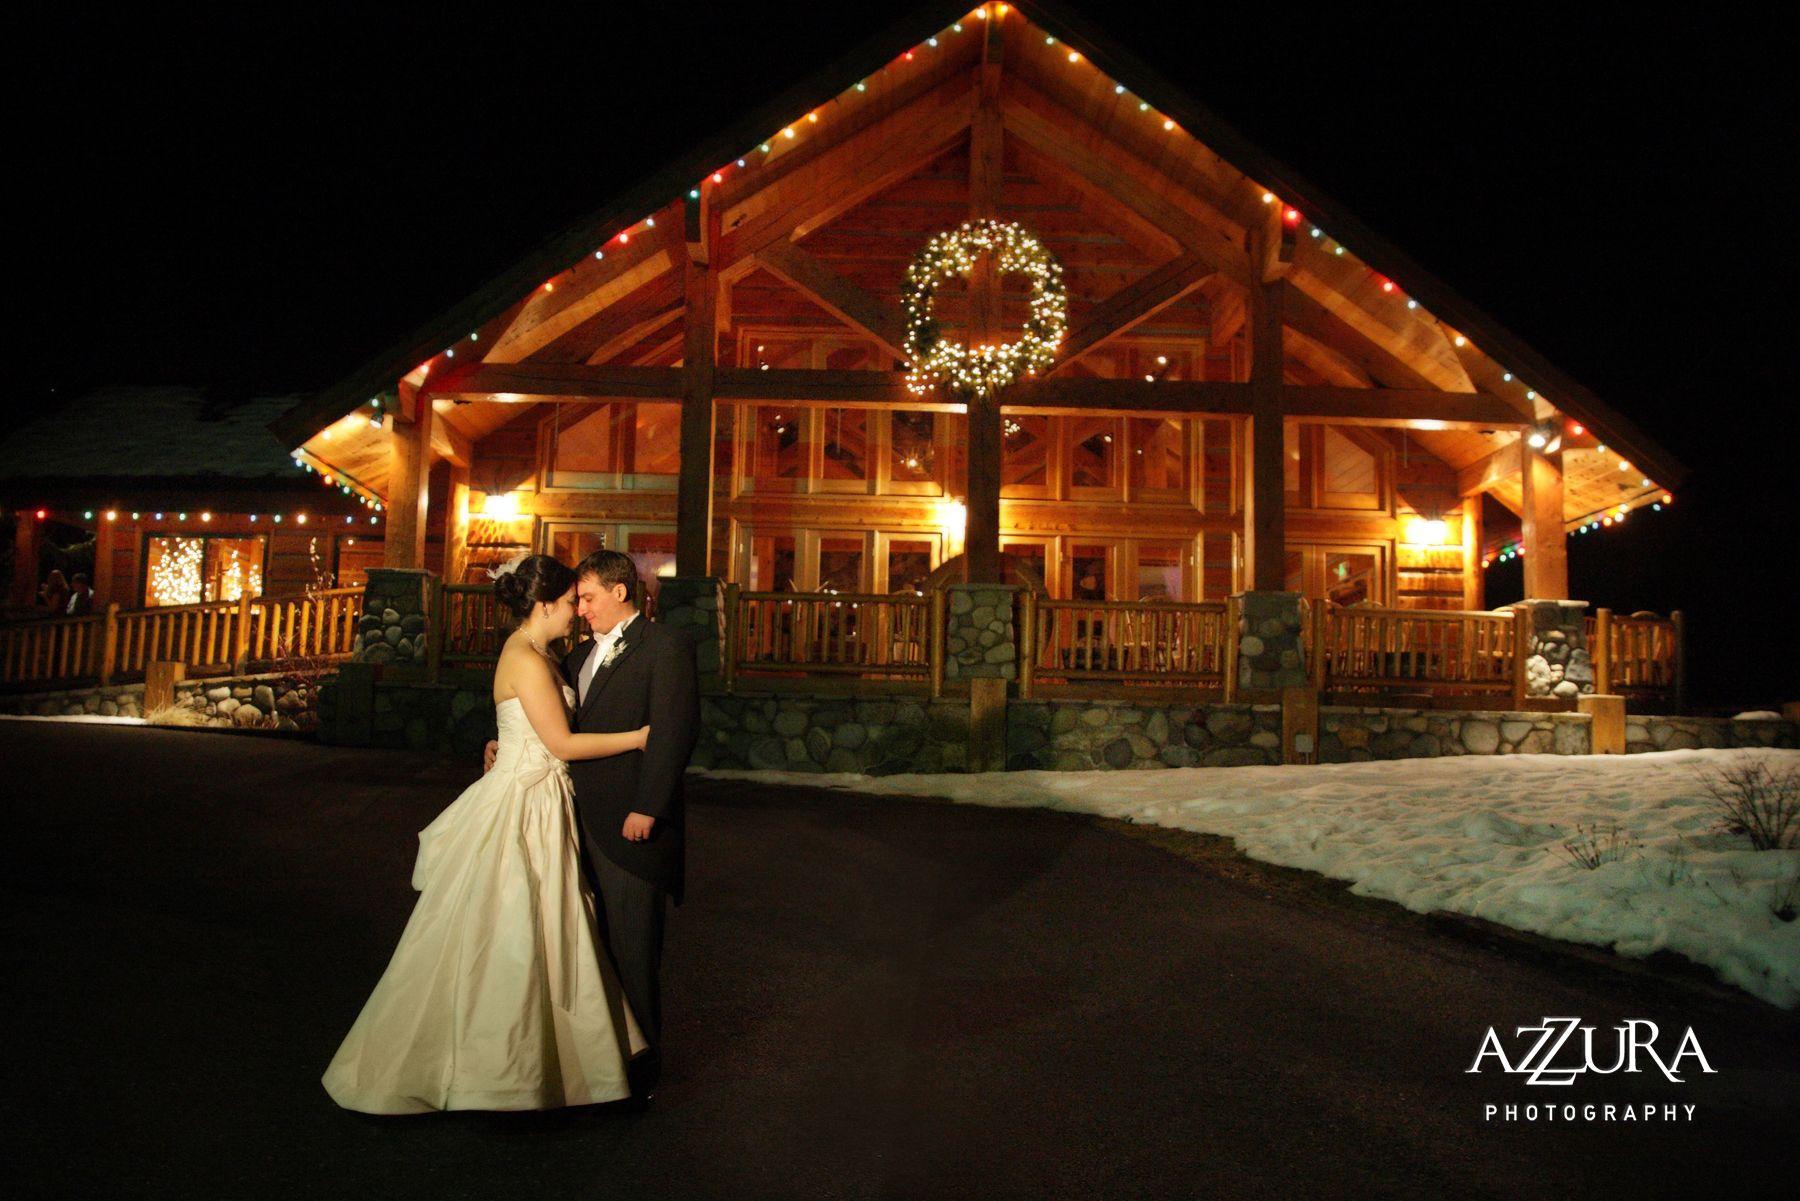 Mountain Springs Lodge In Leavenworth Wa: Winter Wedding Venue Leavenworth At Websimilar.org